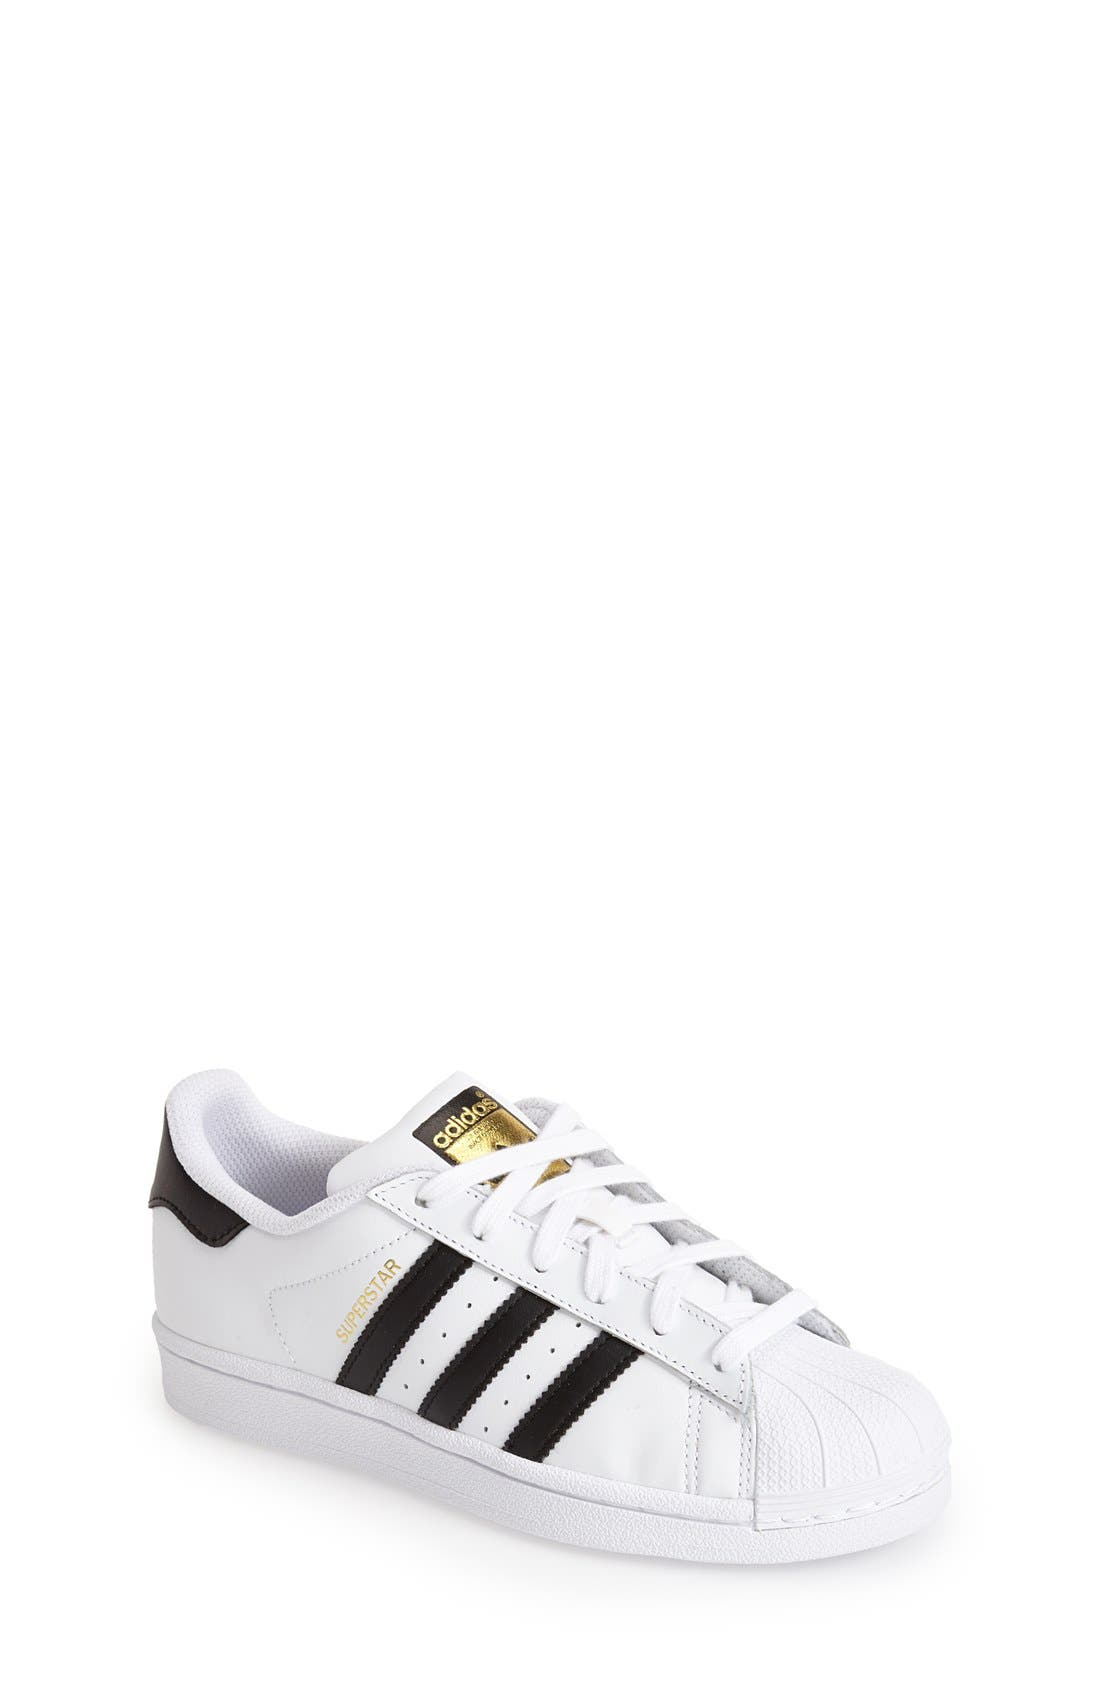 Main Image - adidas \u0027Superstar II\u0027 Sneaker ...